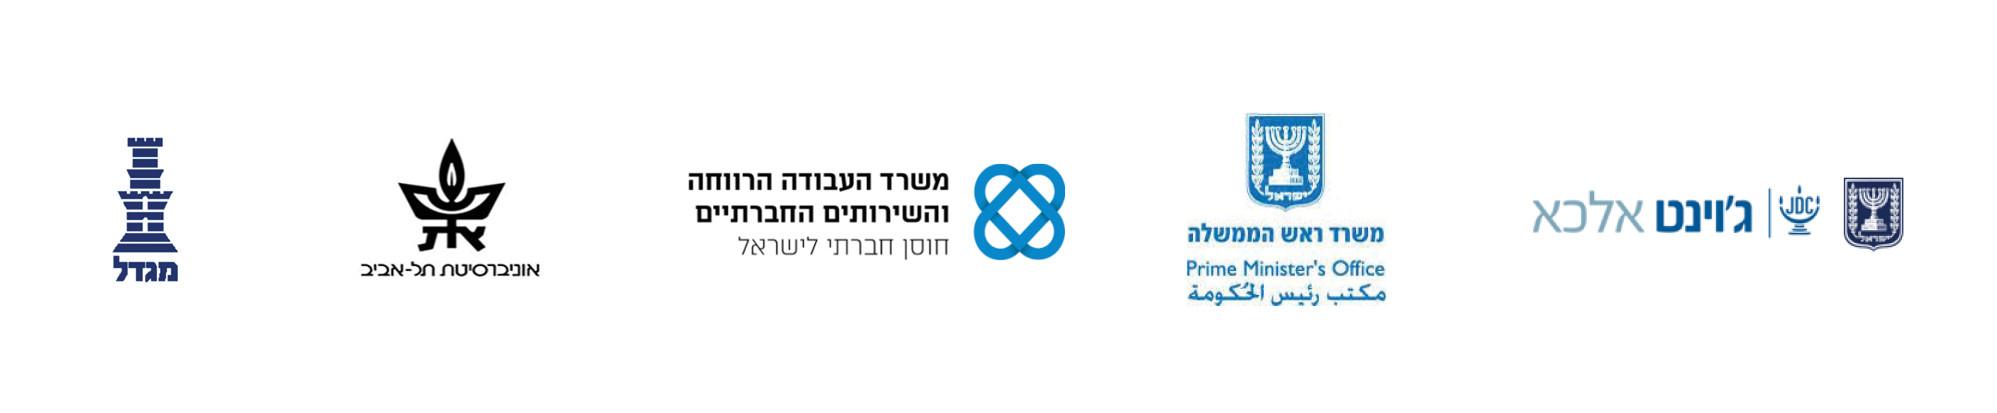 logos_in_line_2021_B4.jpg